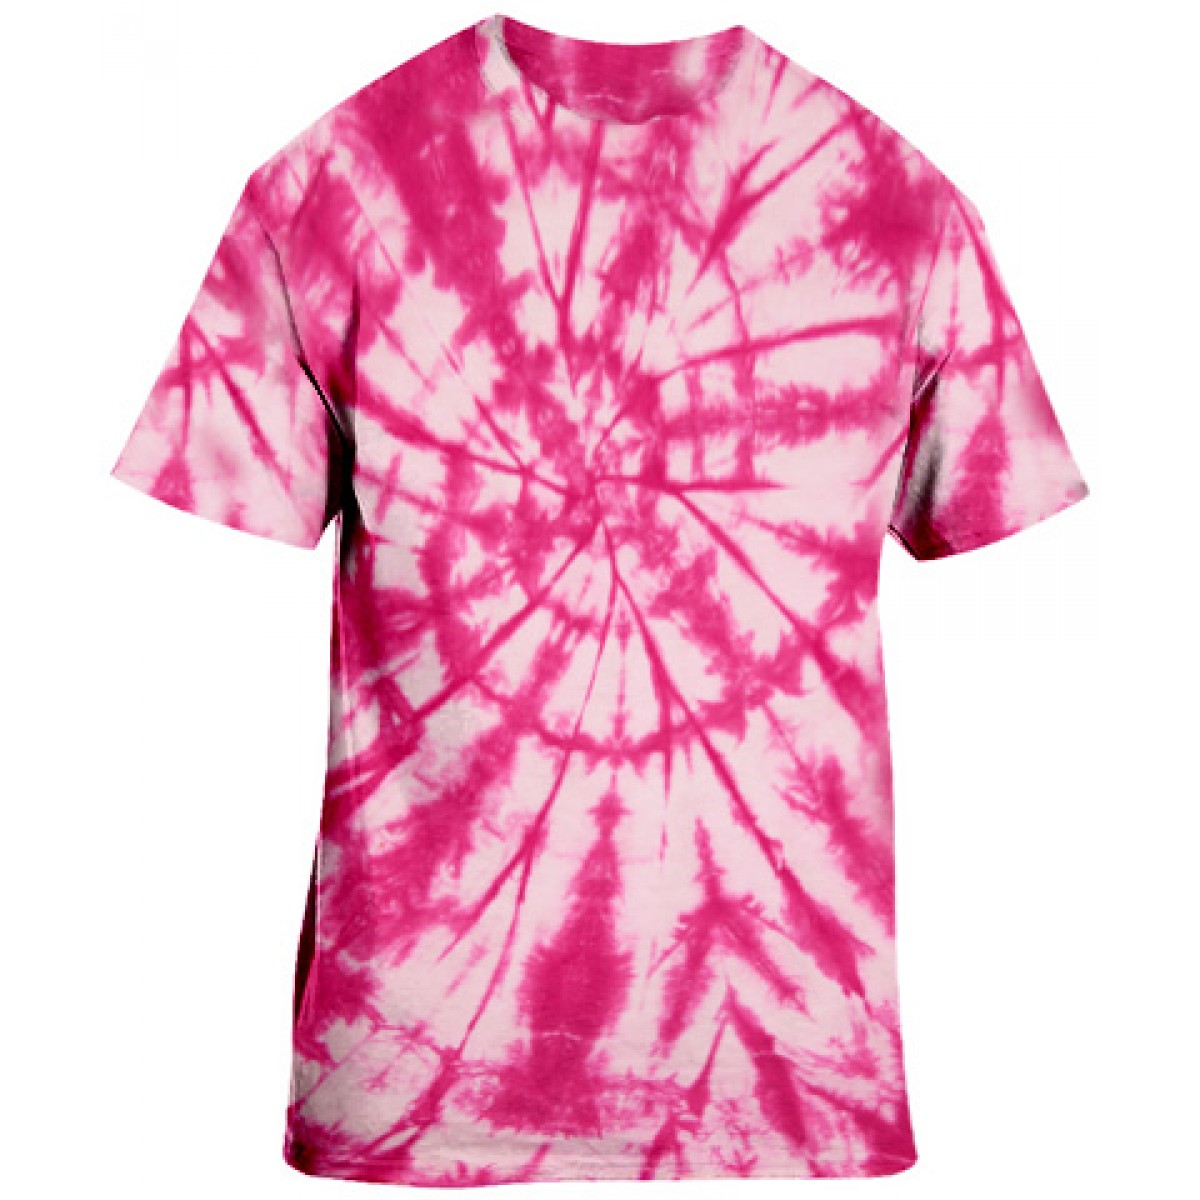 Pink Tie-Dye S/S Tee -Pink-3XL